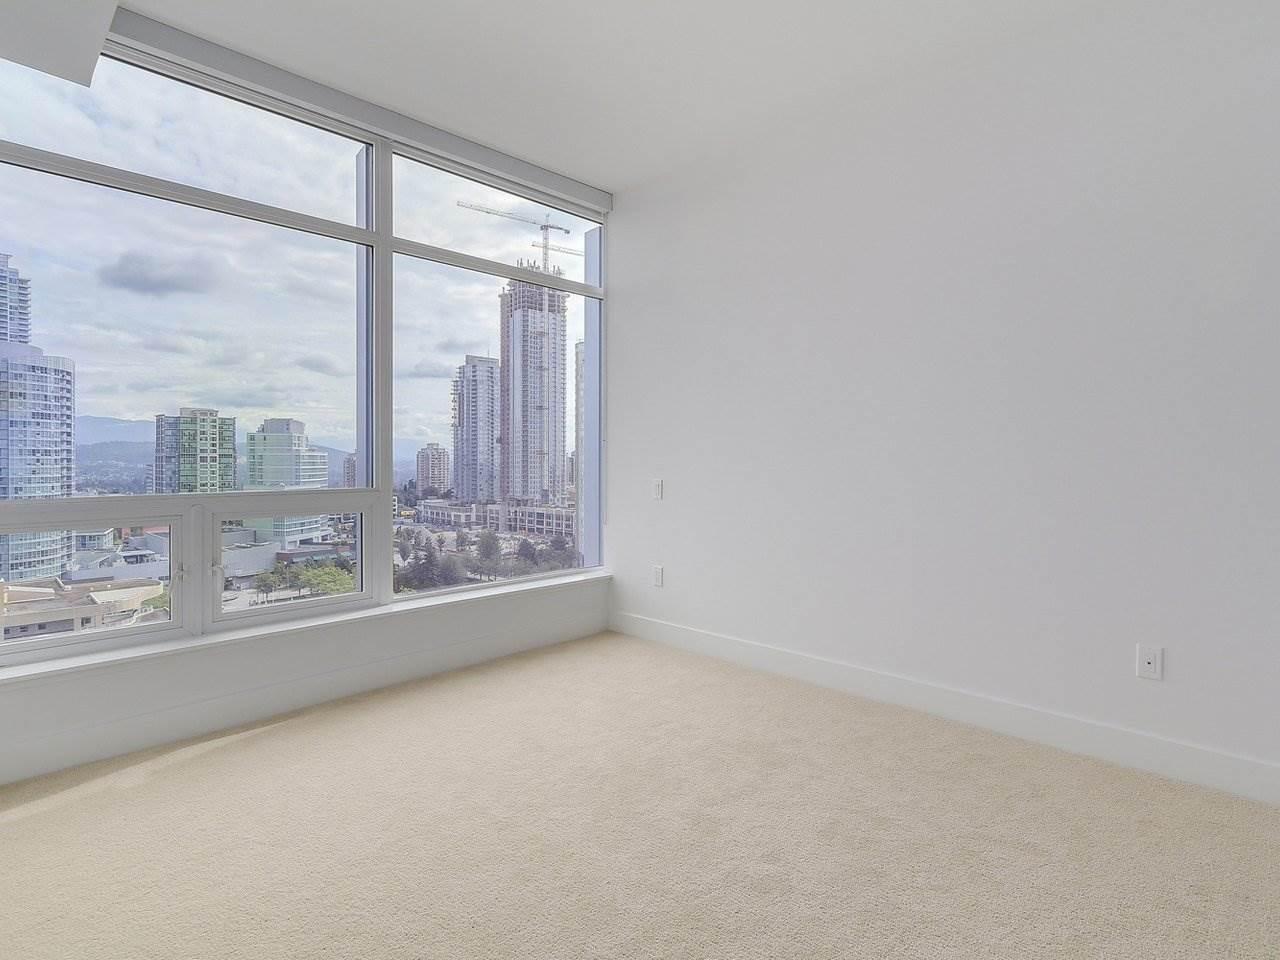 Condo Apartment at 1202 4360 BERESFORD STREET, Unit 1202, Burnaby South, British Columbia. Image 11